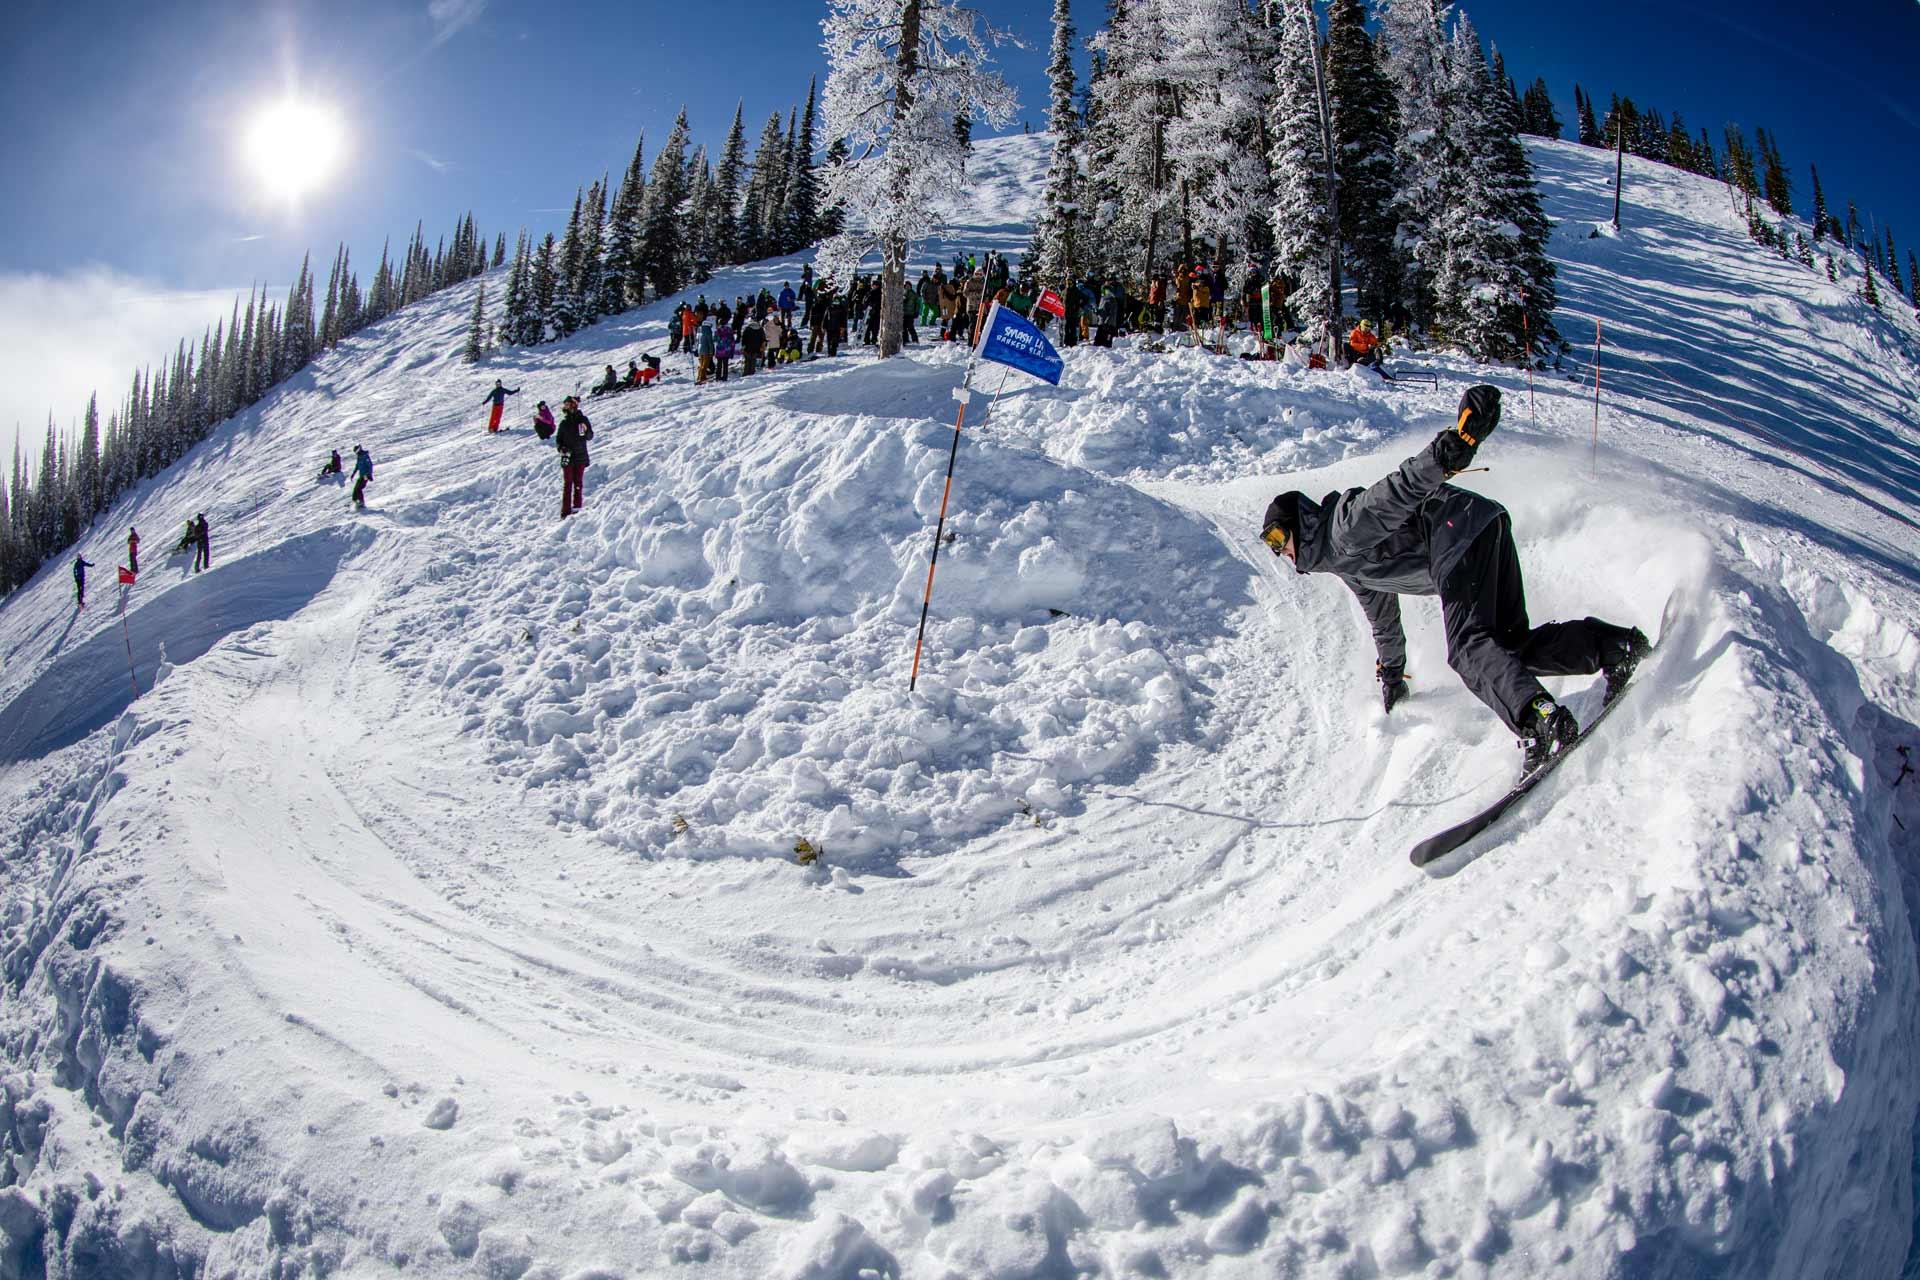 19-20 JHSM. Snowboarding. Smash Life. Rider: Calvin Patterson. Photo: Ben Gavelda